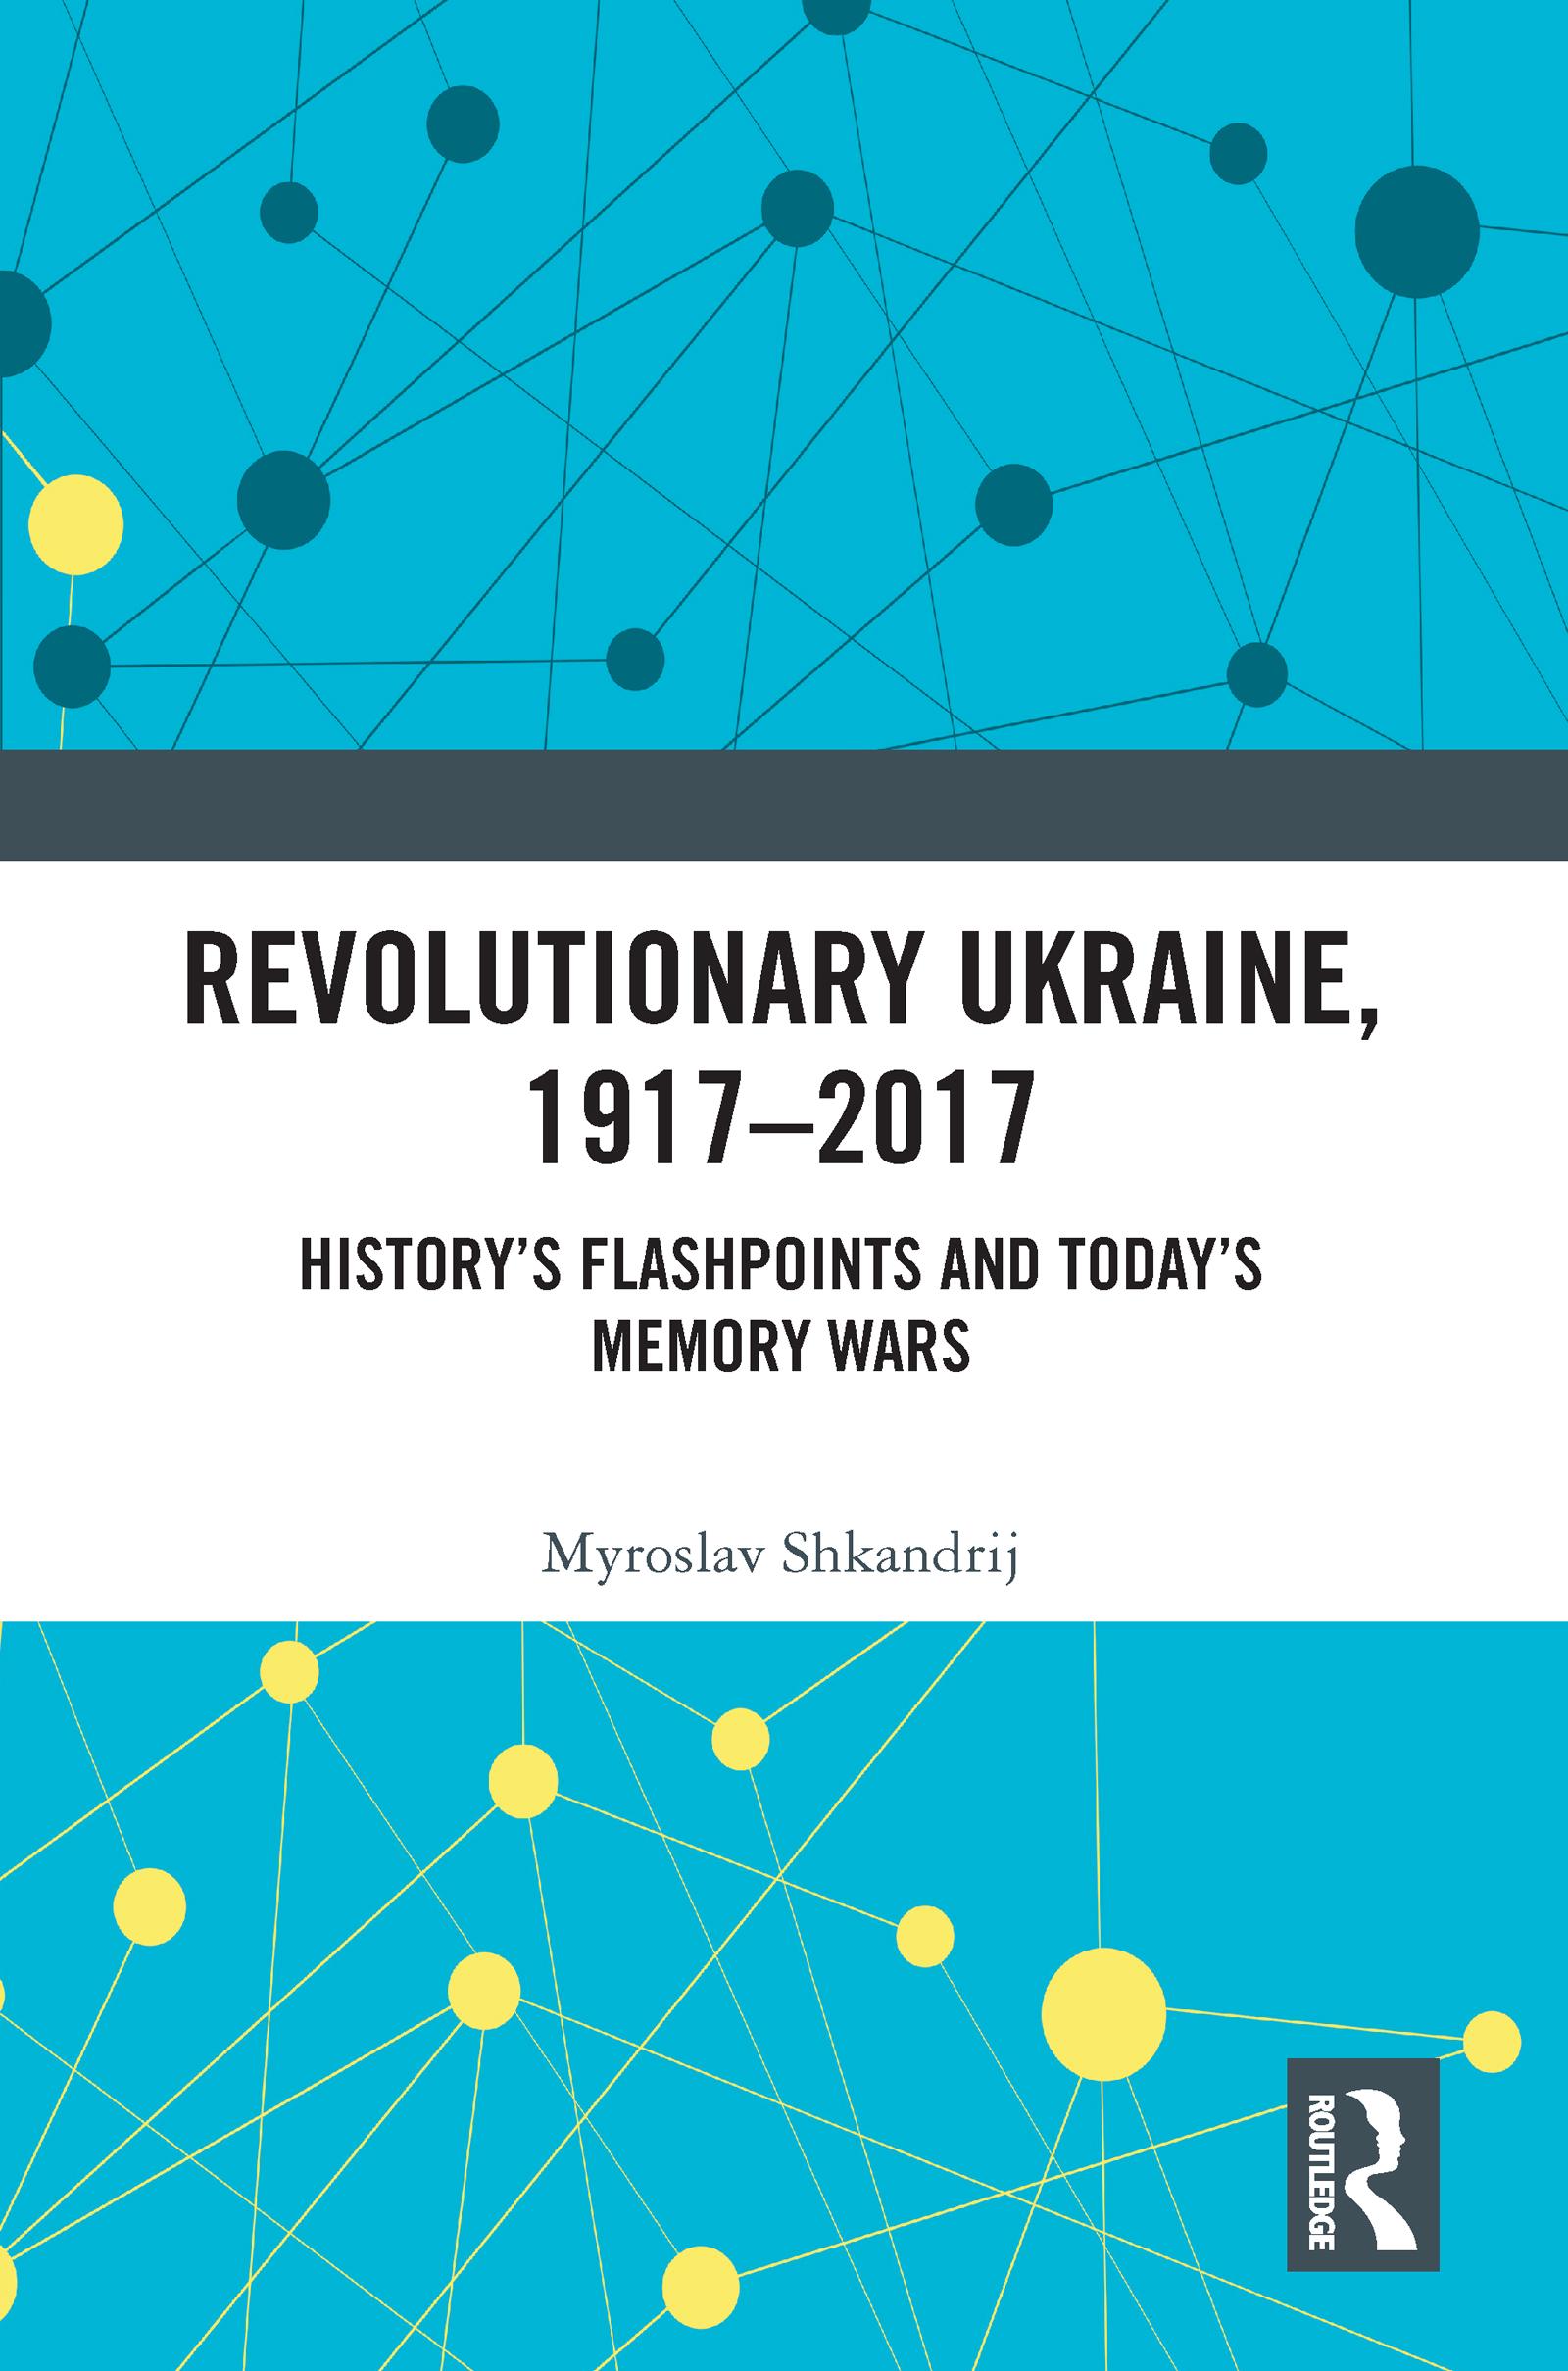 Revolutionary Ukraine, 1917-2017